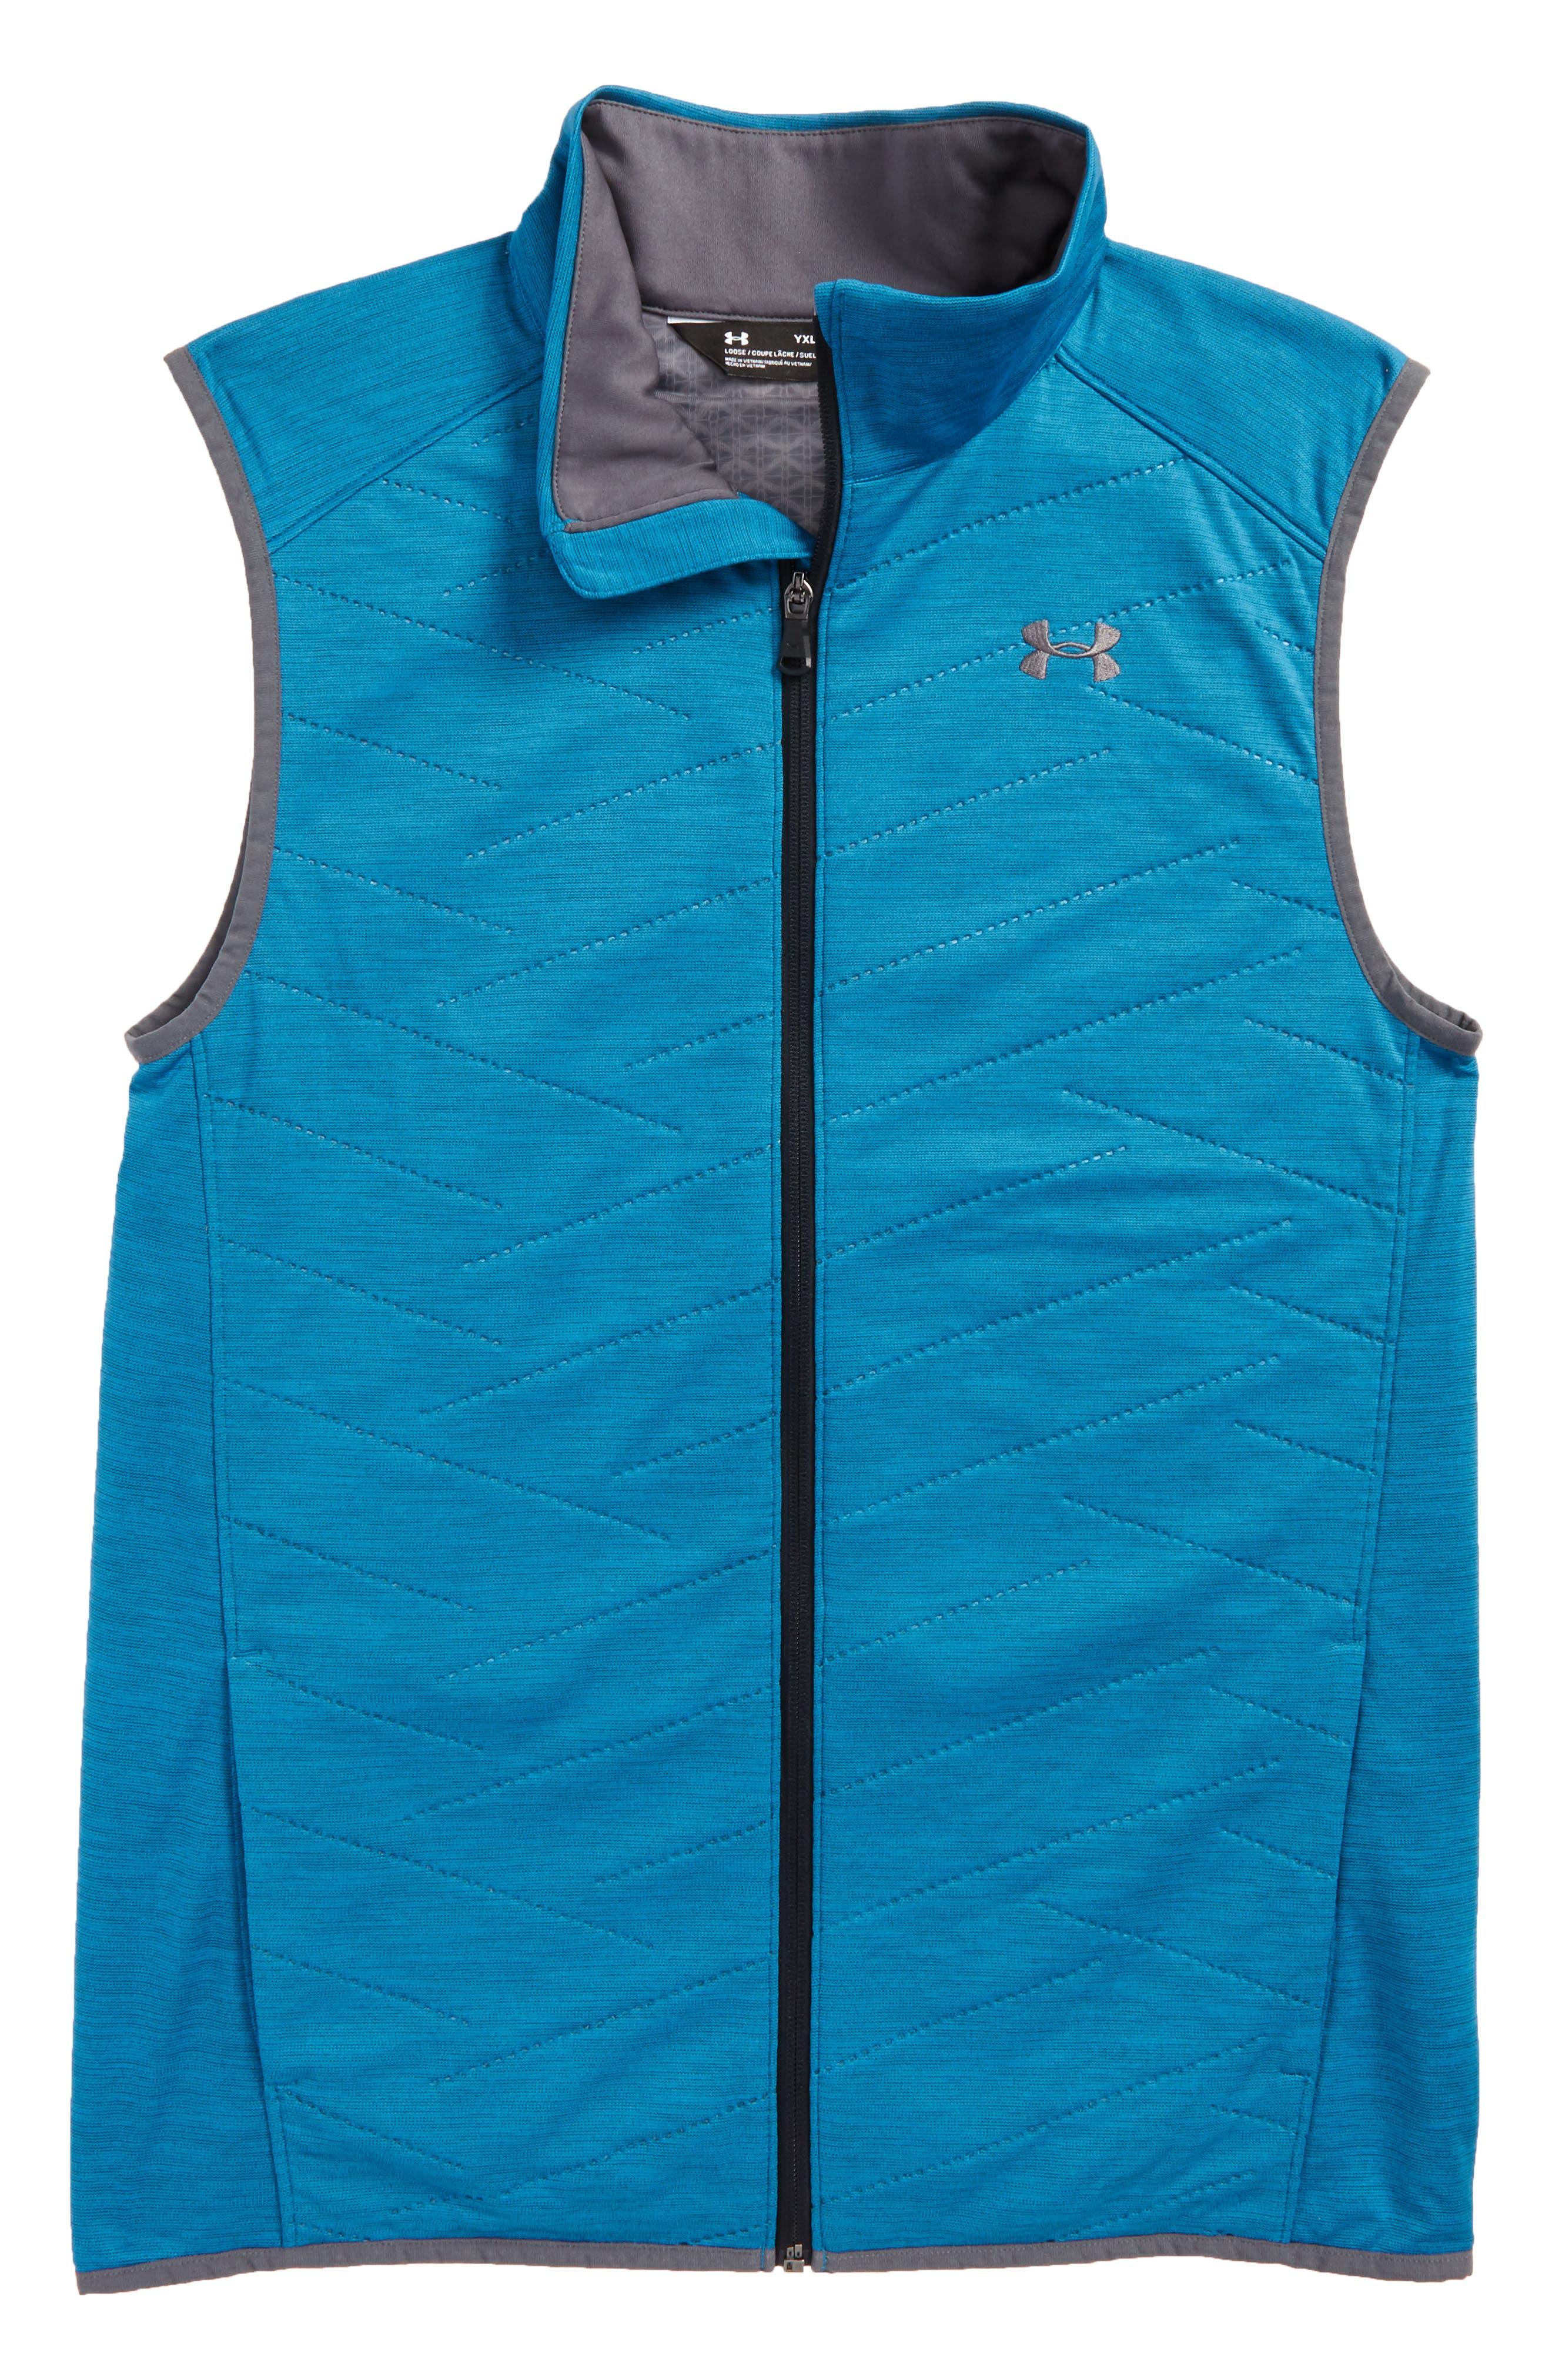 ColdGear<sup>®</sup> Reactor Hybrid Vest,                         Main,                         color, Bayou Blue/ Rhino Gray